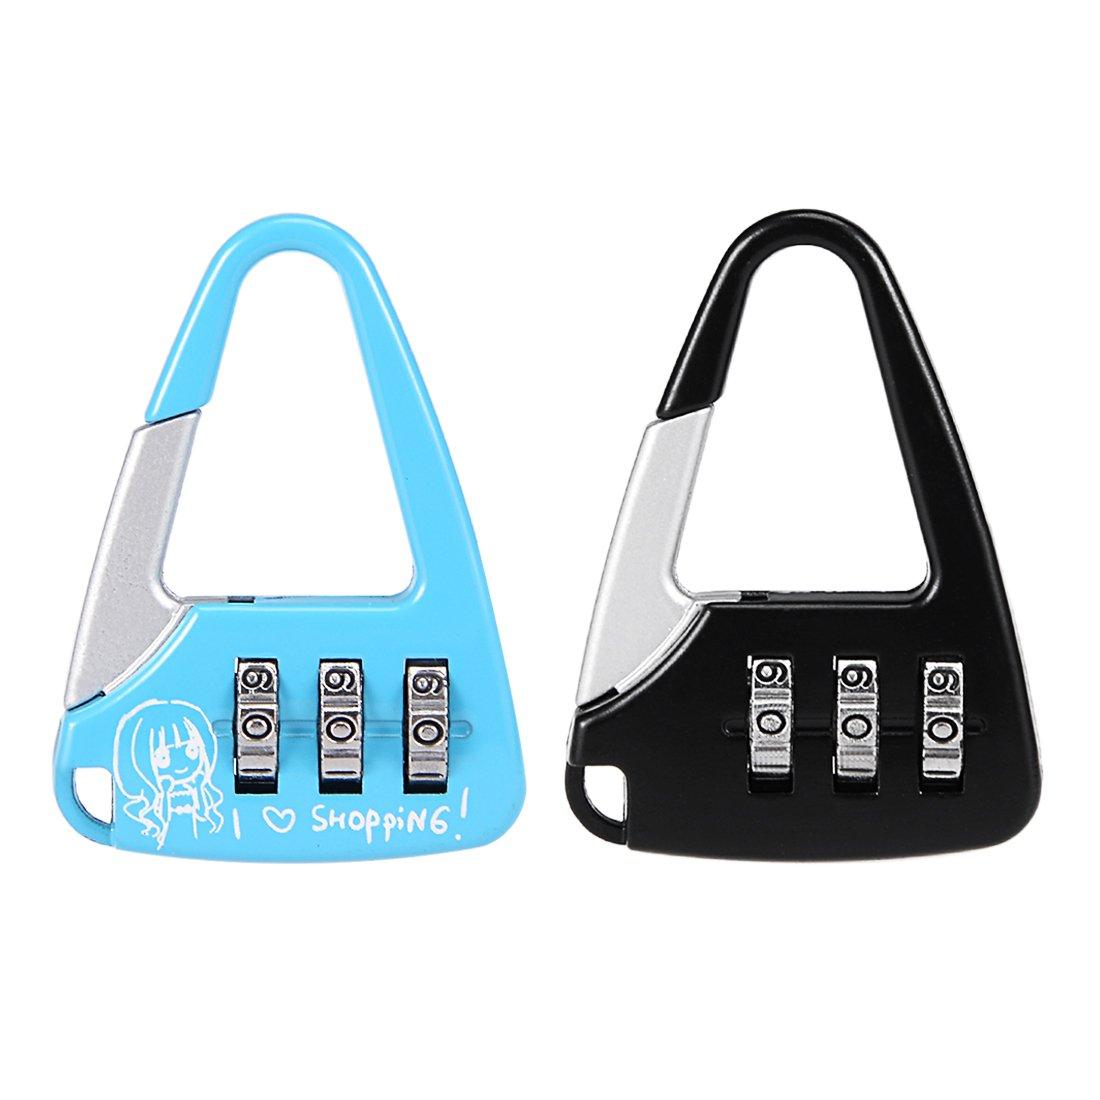 uxcell 2pcs 3 Digit Combination Padlock 3.5mm Shackle Zinc Alloy Lock Blue Black